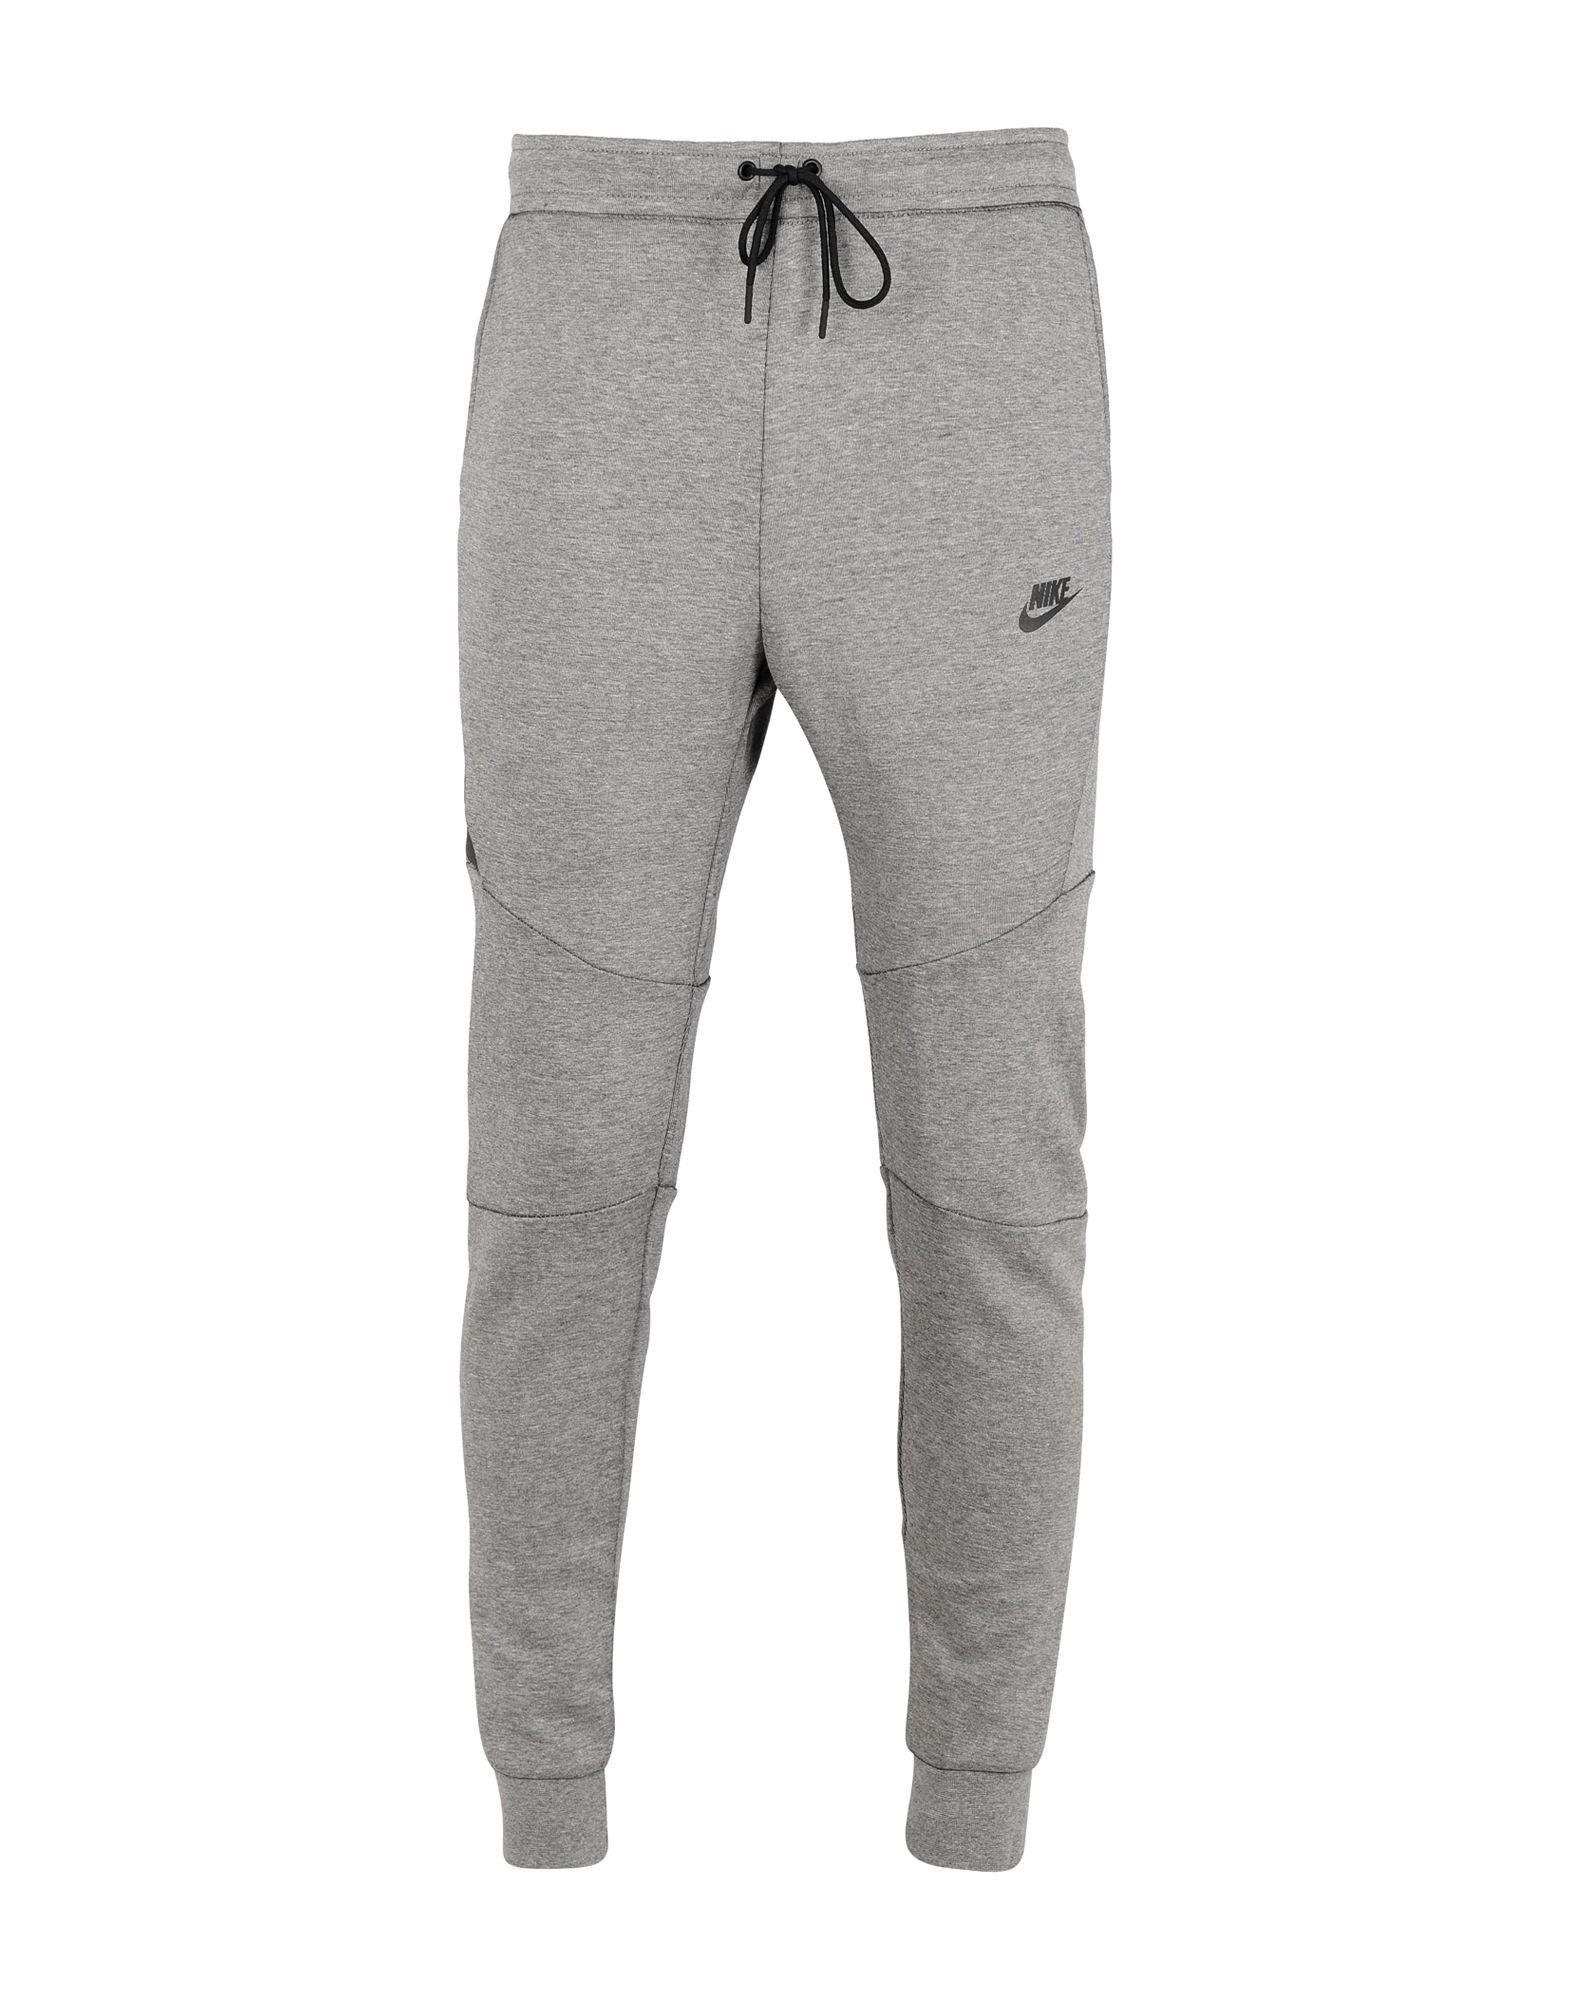 Sensible medida Frenesí  pantalon nike algodon hombre outlet online 7fc99 49b87